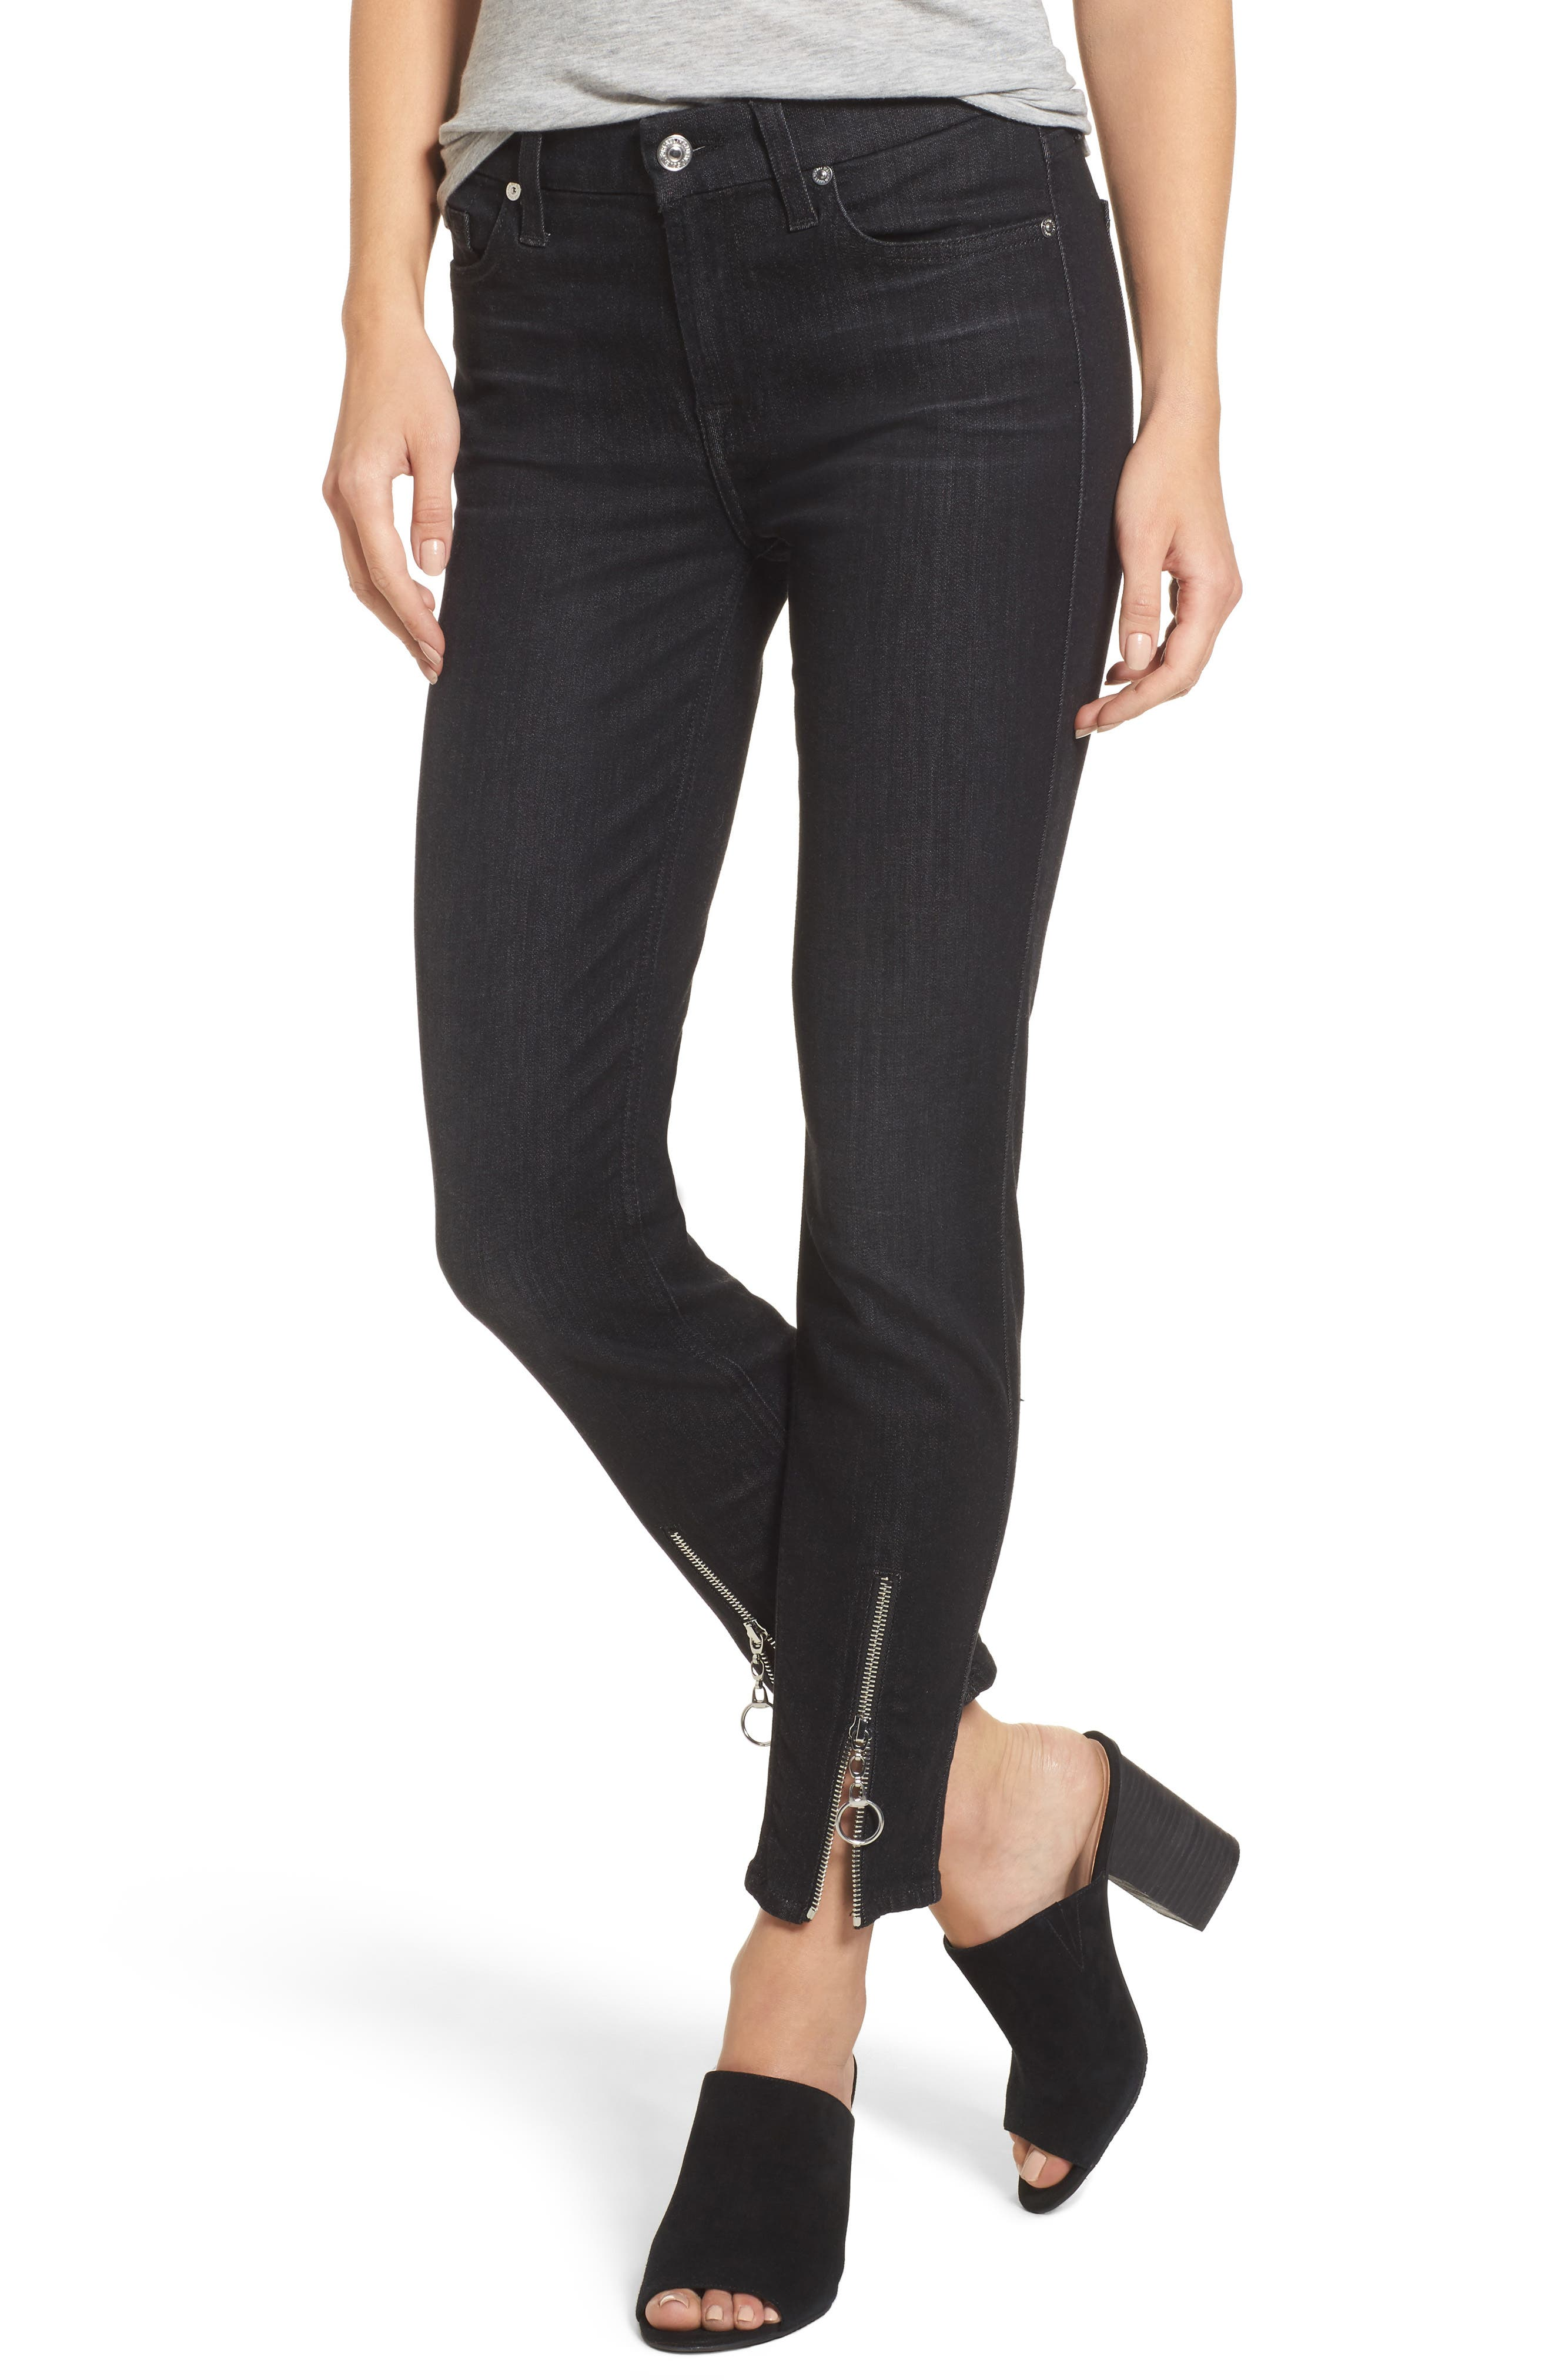 b(air) - Roxanne Ankle Zip Jeans,                         Main,                         color, Bair Noir